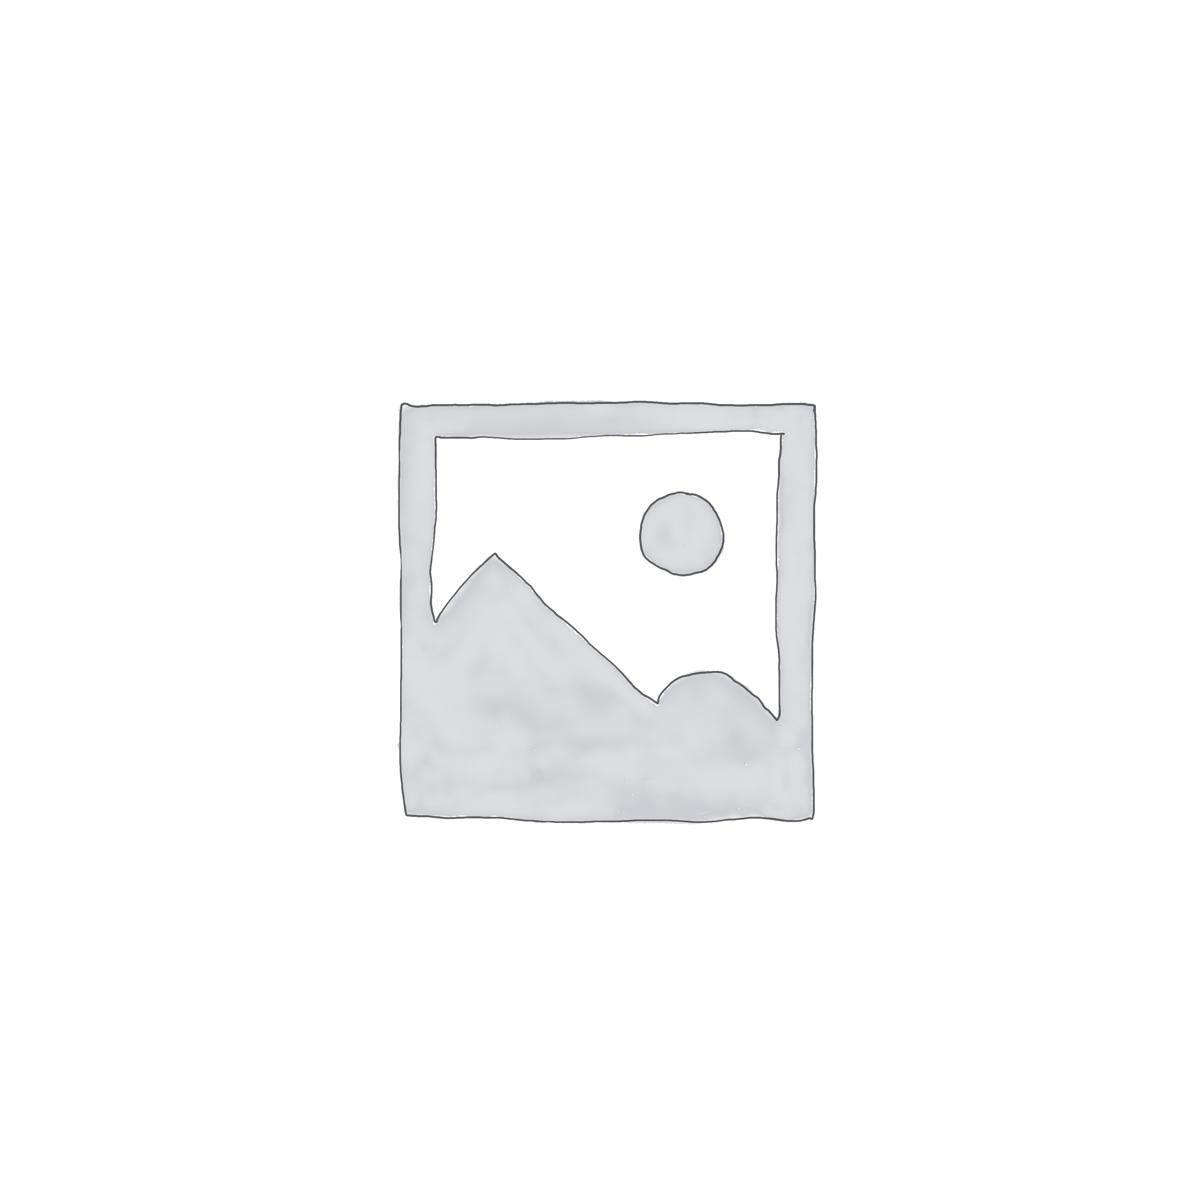 Seashell Pattern Wallpaper Mural for Nursery and Kids Room